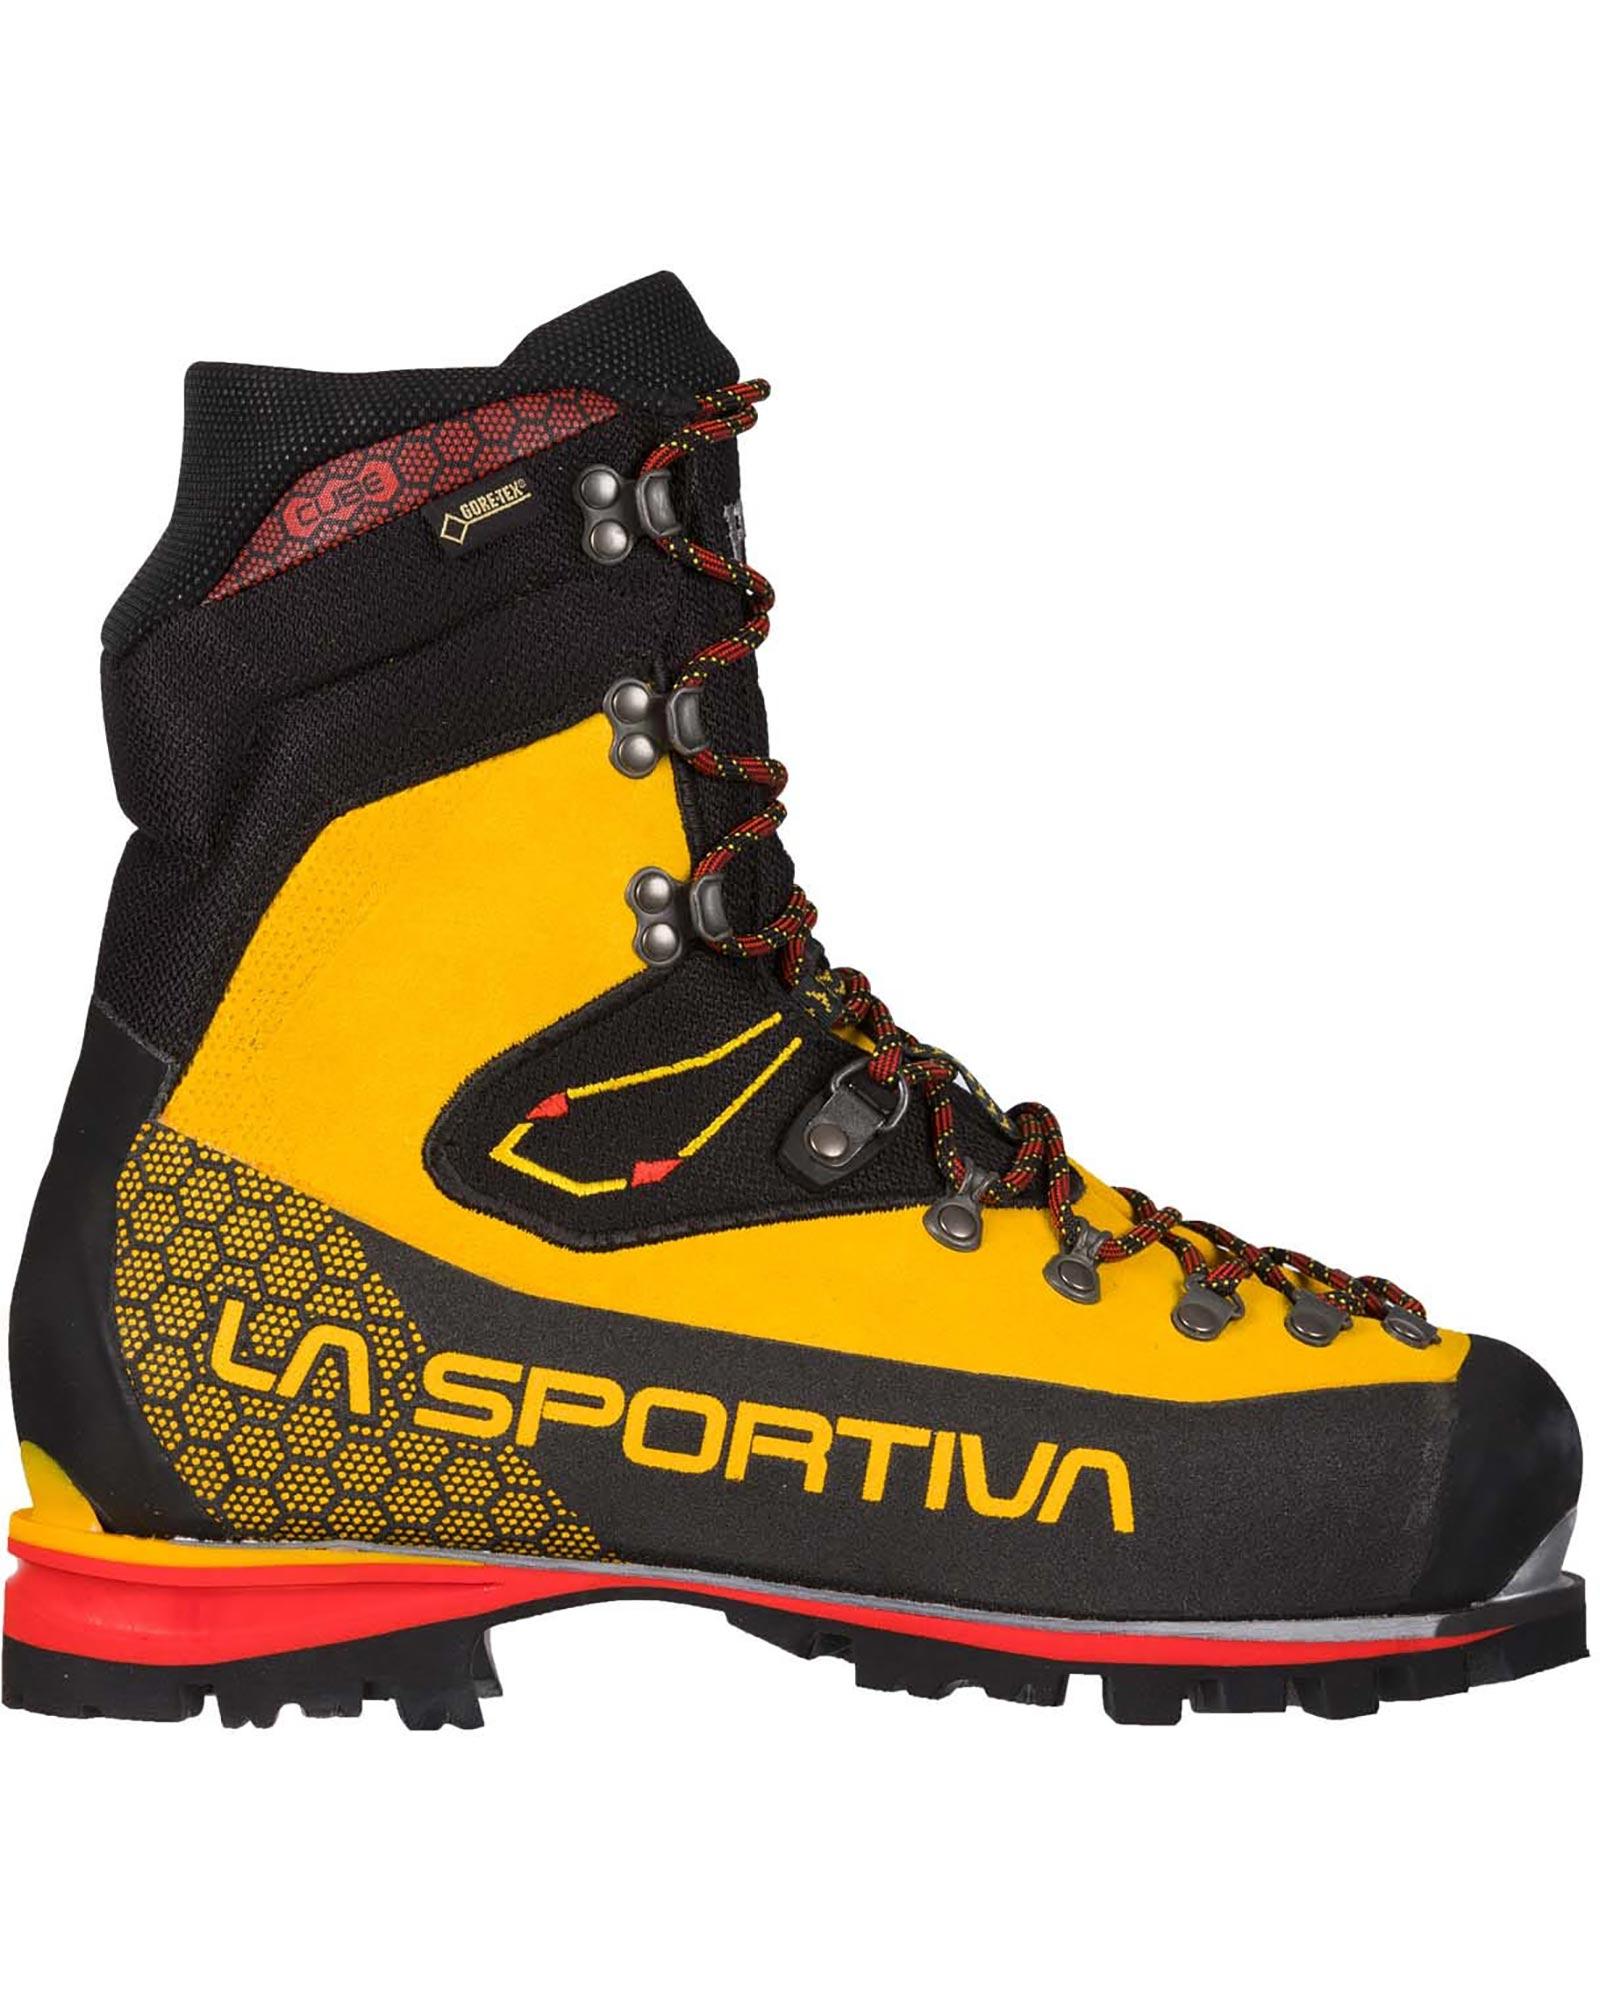 La Sportiva Men's Nepal Cube GORE-TEX Mountaineering Boots 0